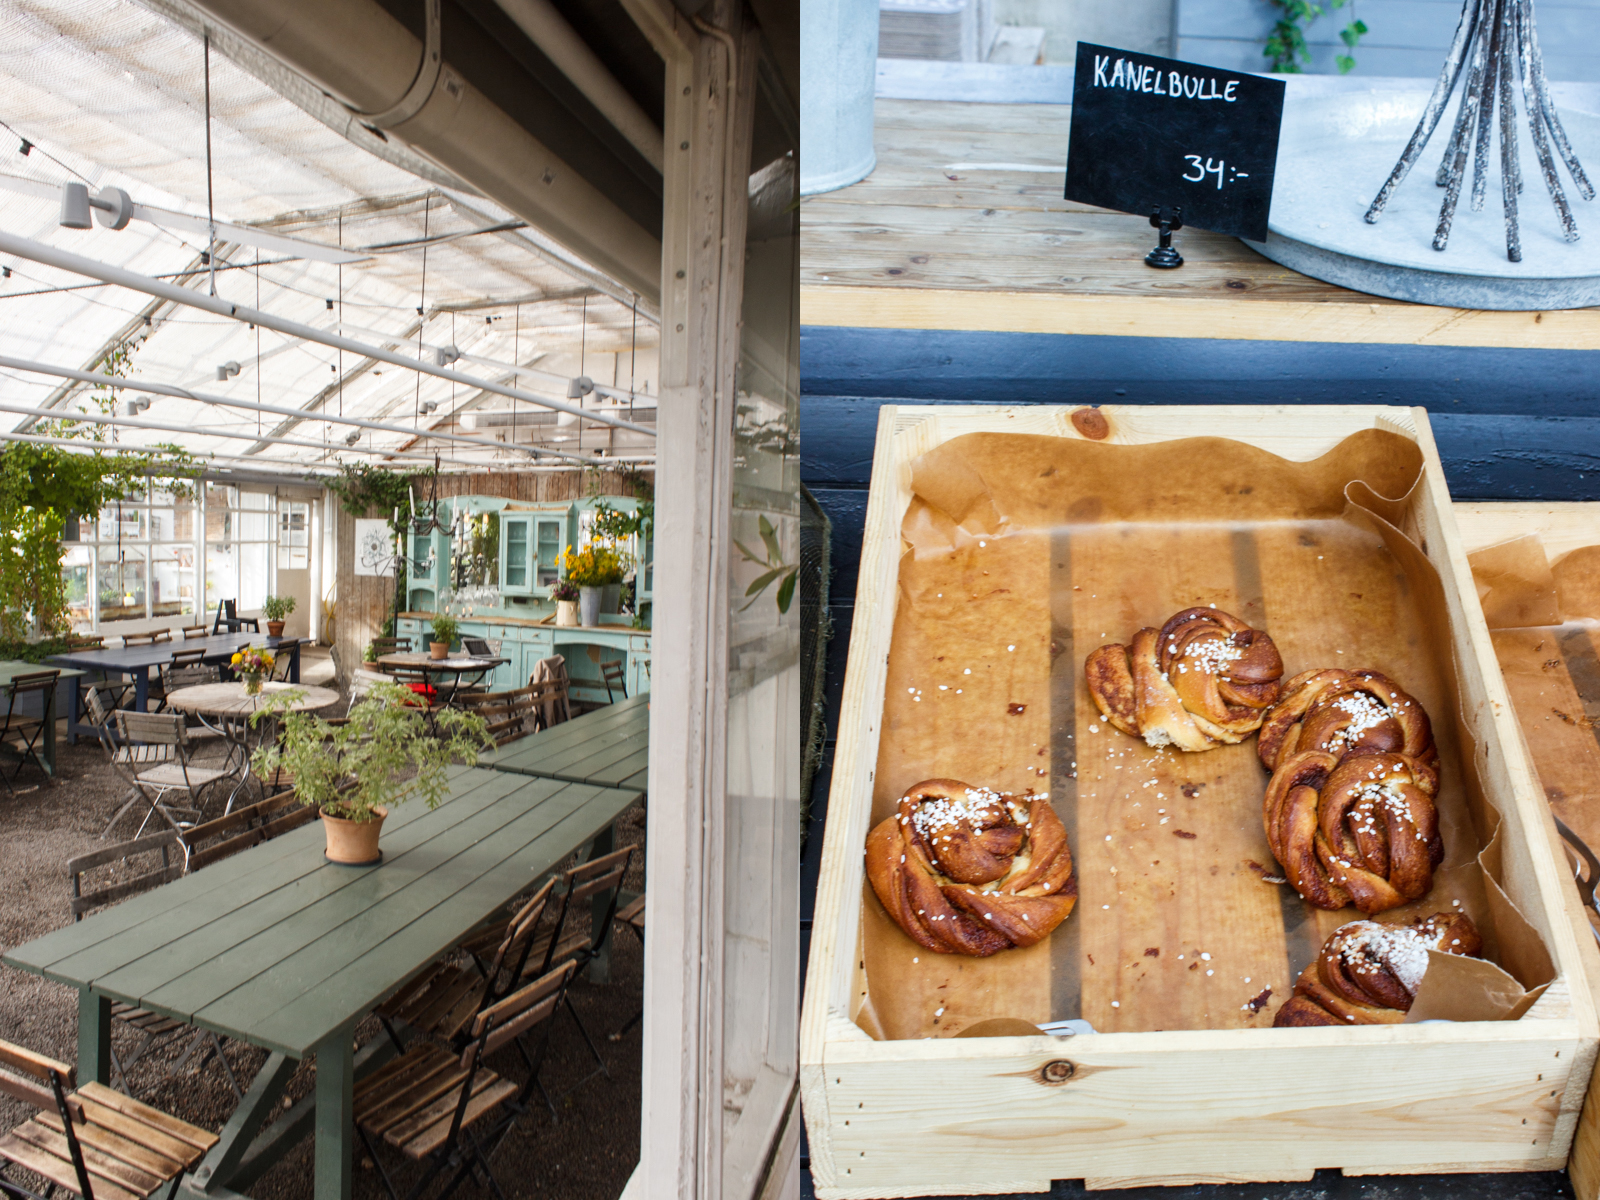 Cafe RosendalsTradgard1